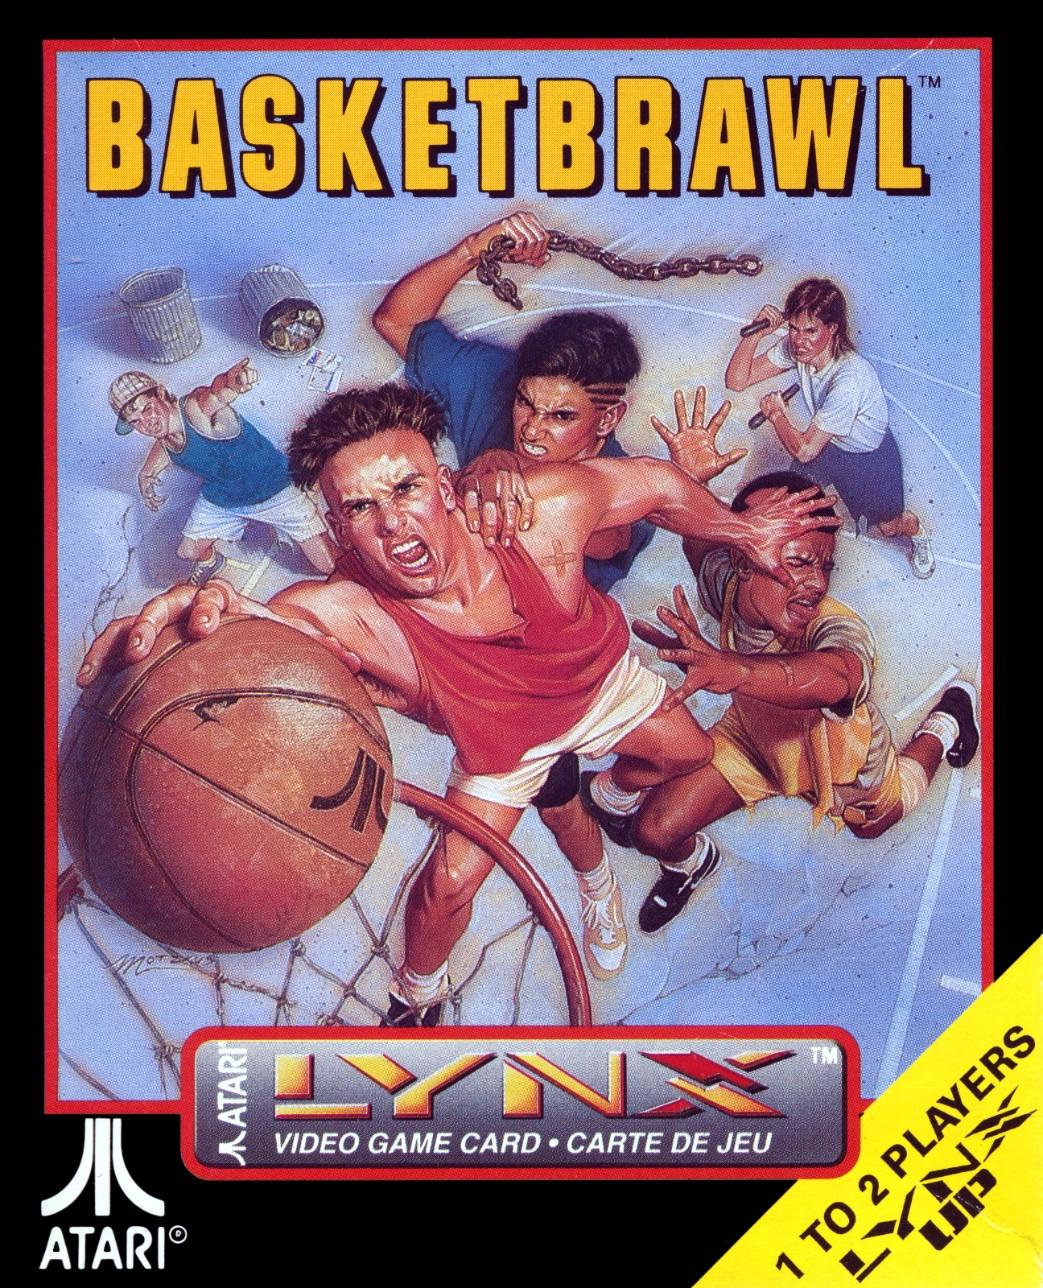 Image of Basketbrawl